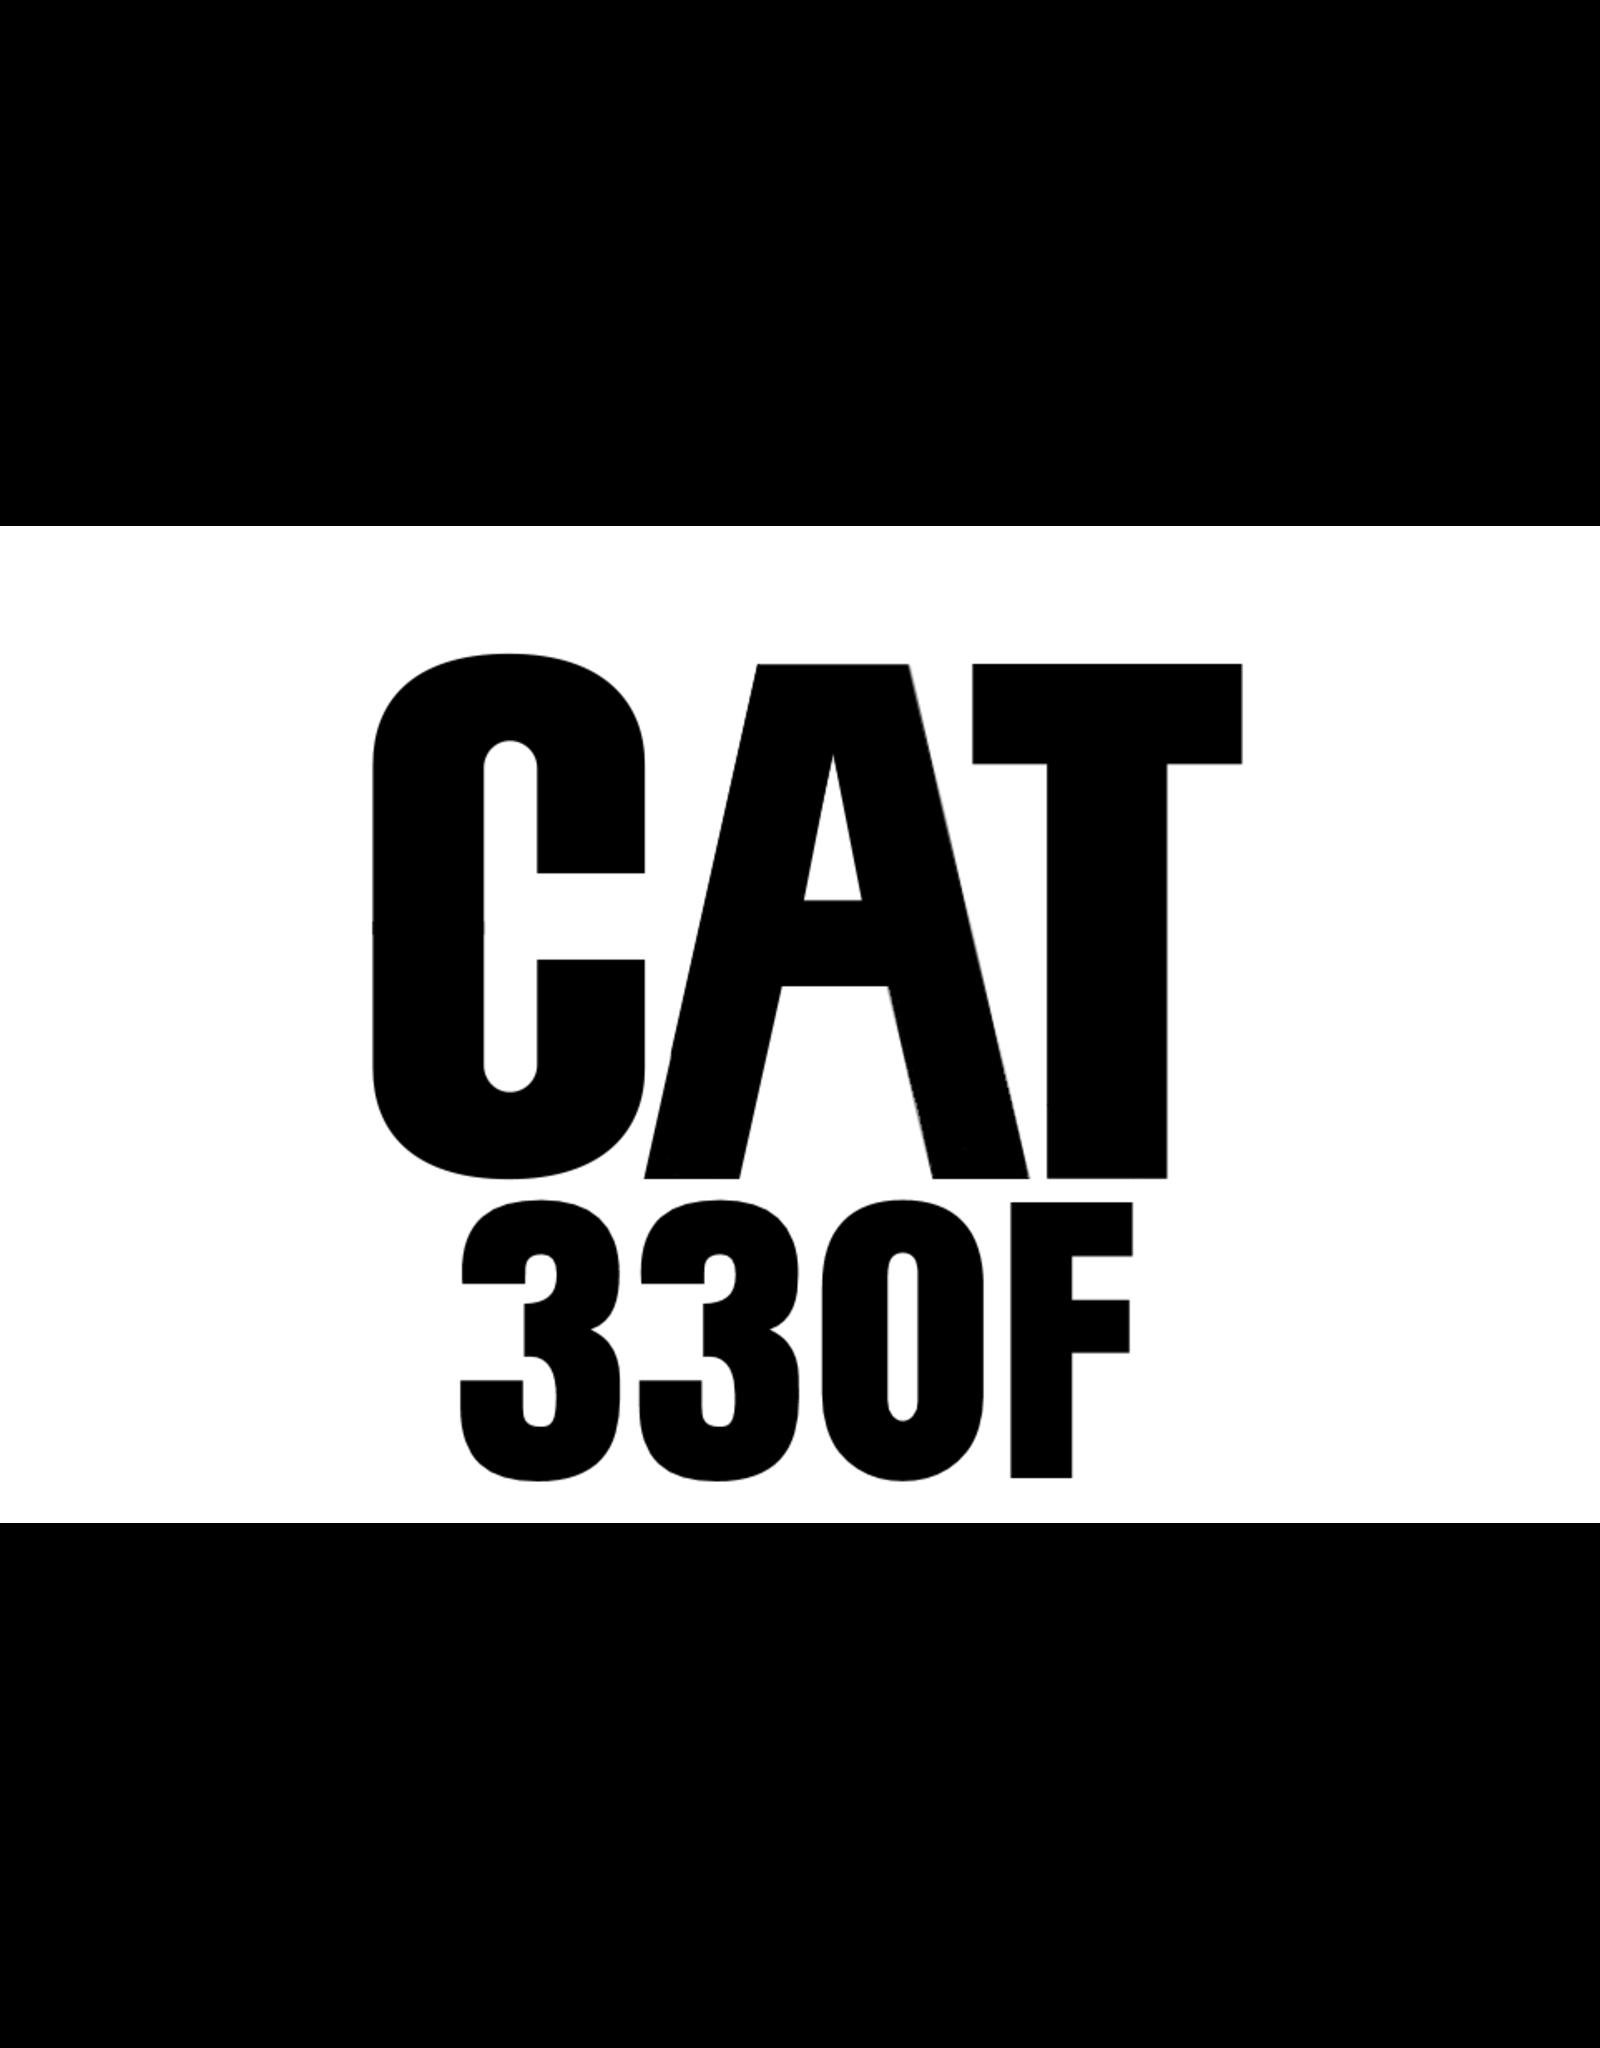 Echle Hartstahl GmbH FOPS for CAT 330F